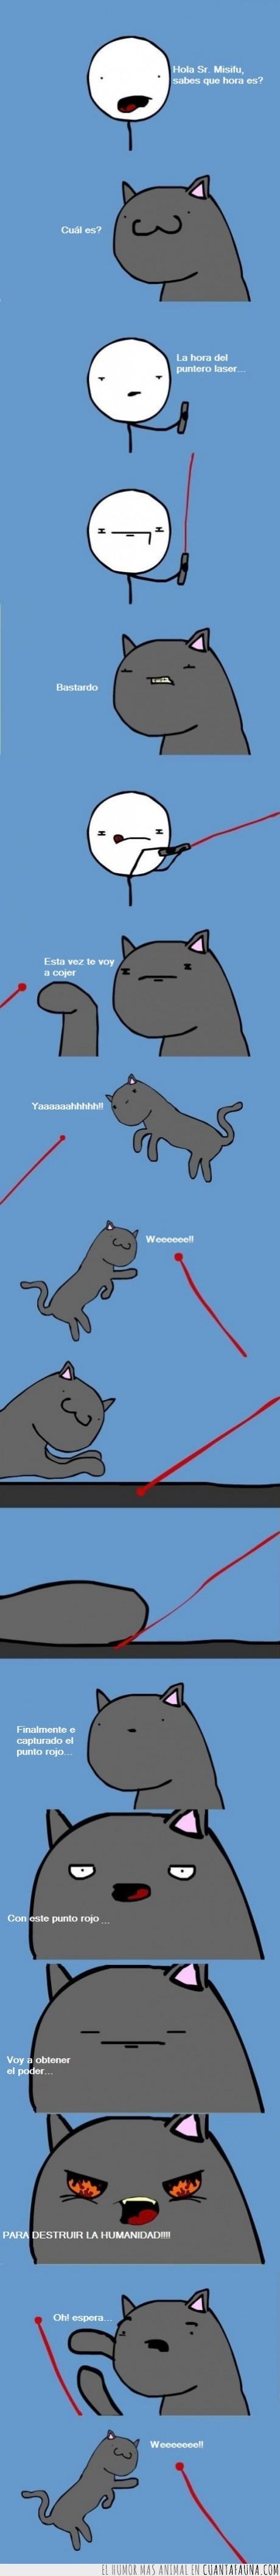 diversion,dueño,gato,laser,mal,puntero,punto,weeeeee